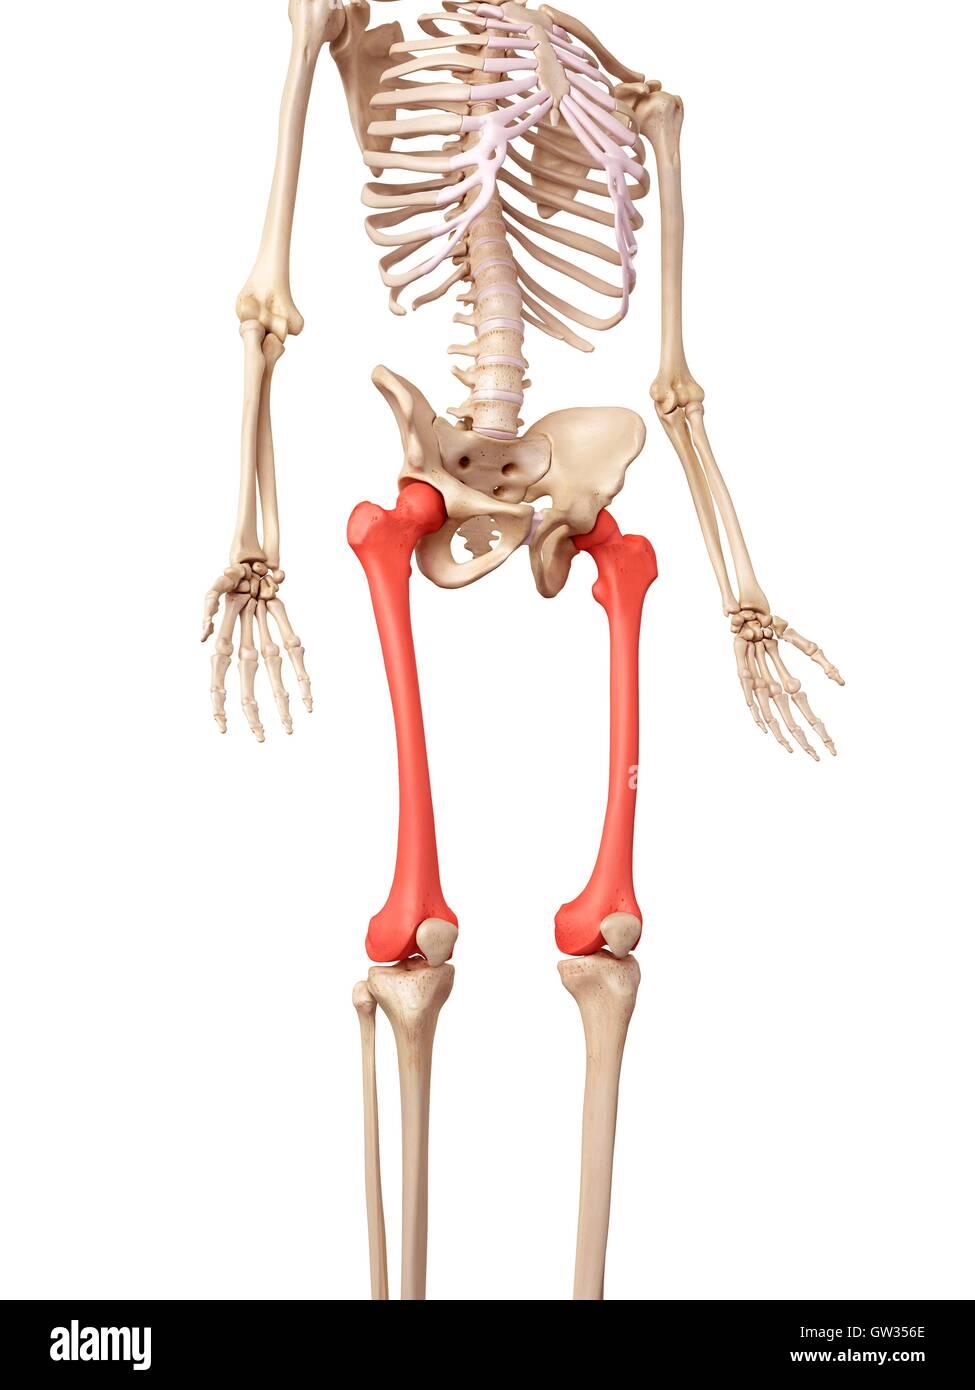 Human Leg Bones Illustration Stock Photo 118698566 Alamy